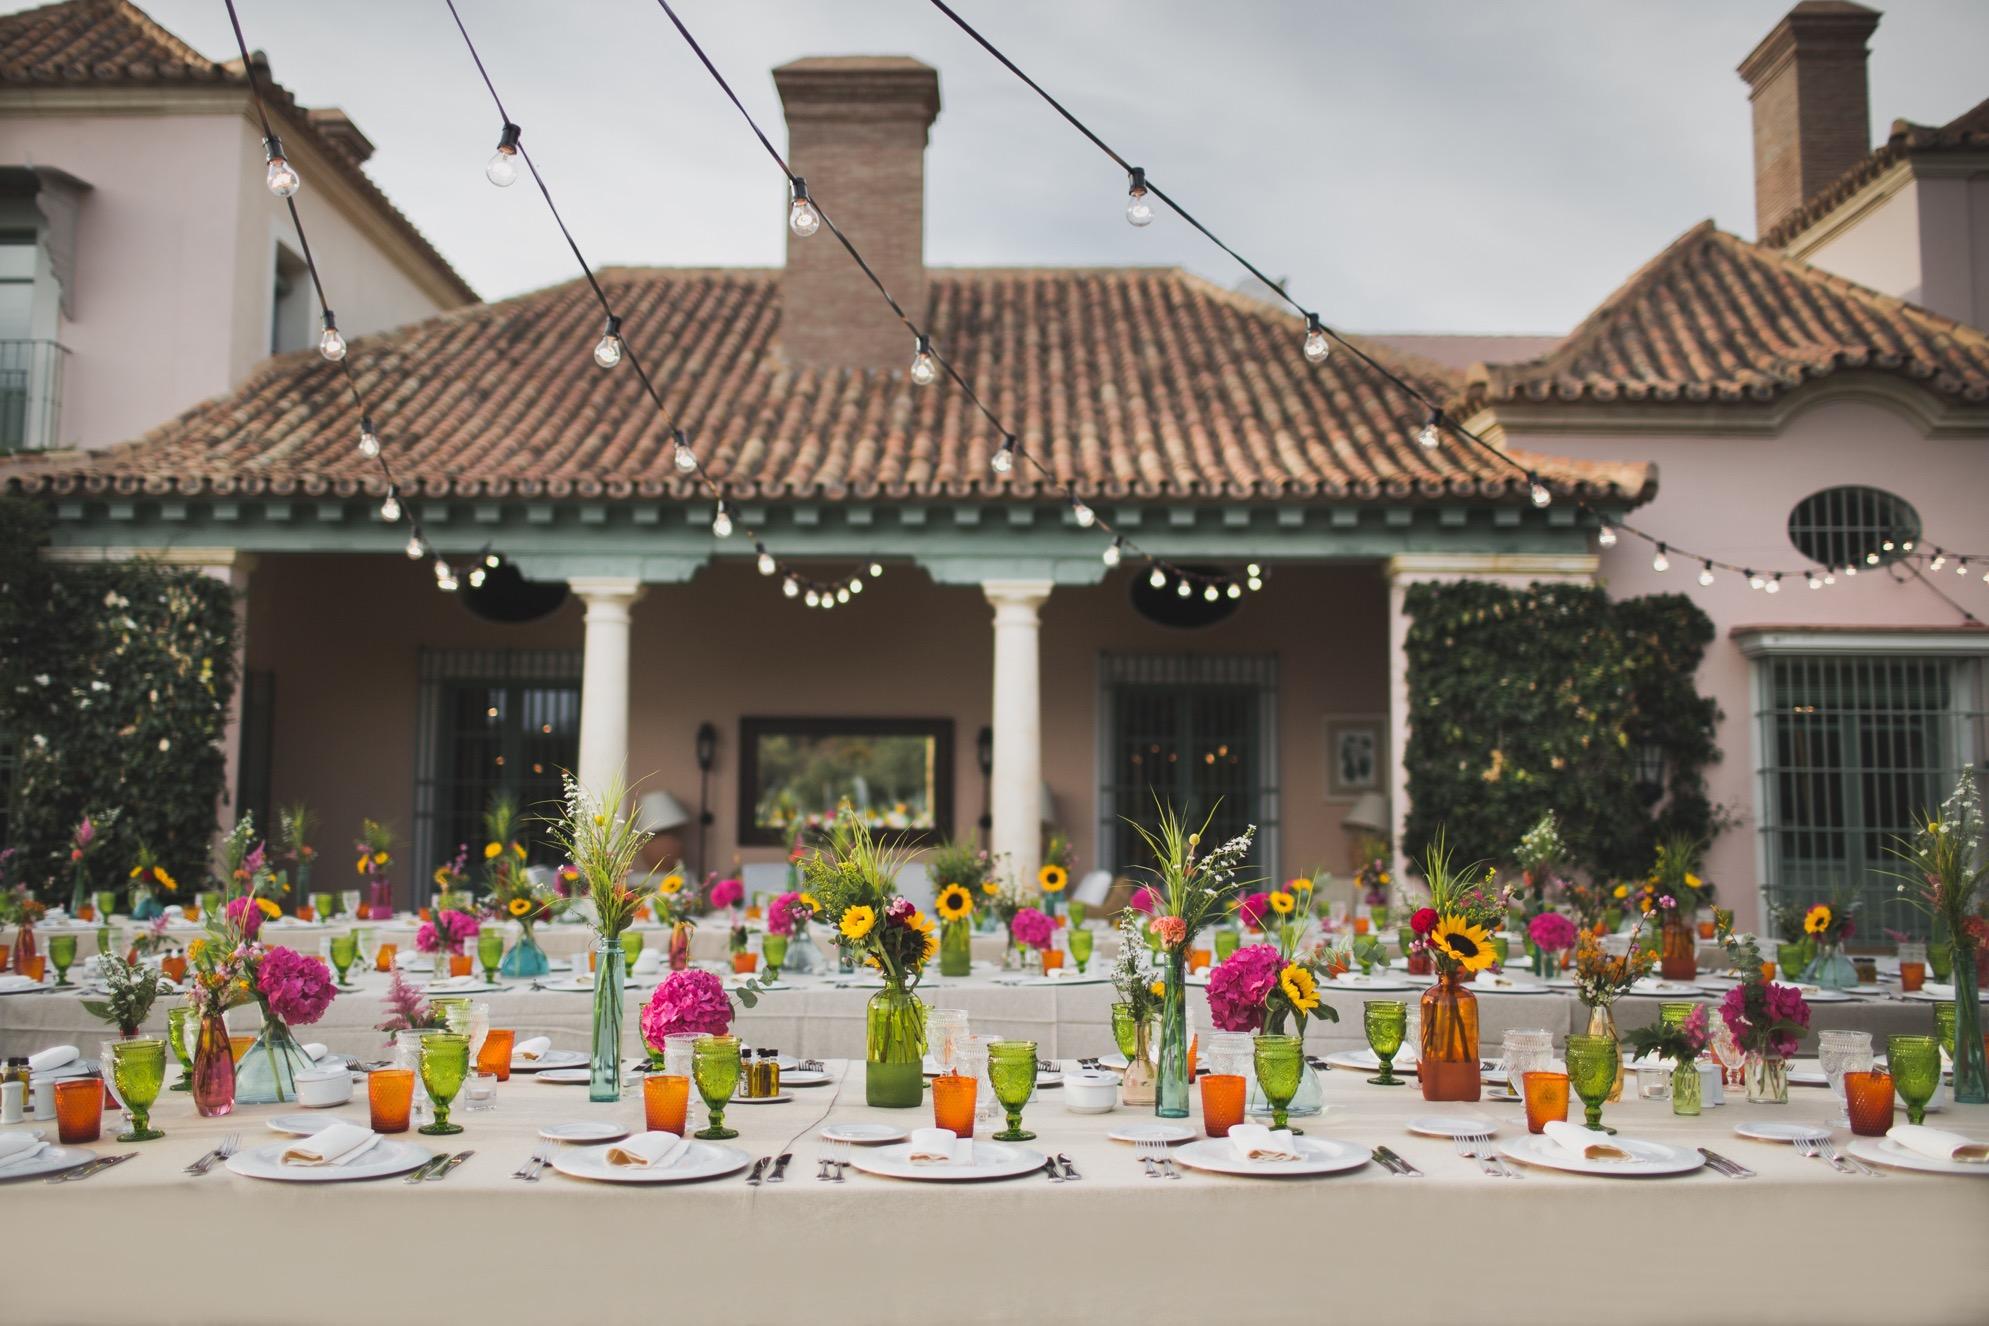 Si-Quiero-Wedding-Planner-By-Sira-Antequera-Bodas-Málaga-Marbella-Miami- PATRICIA-JUANLU-001